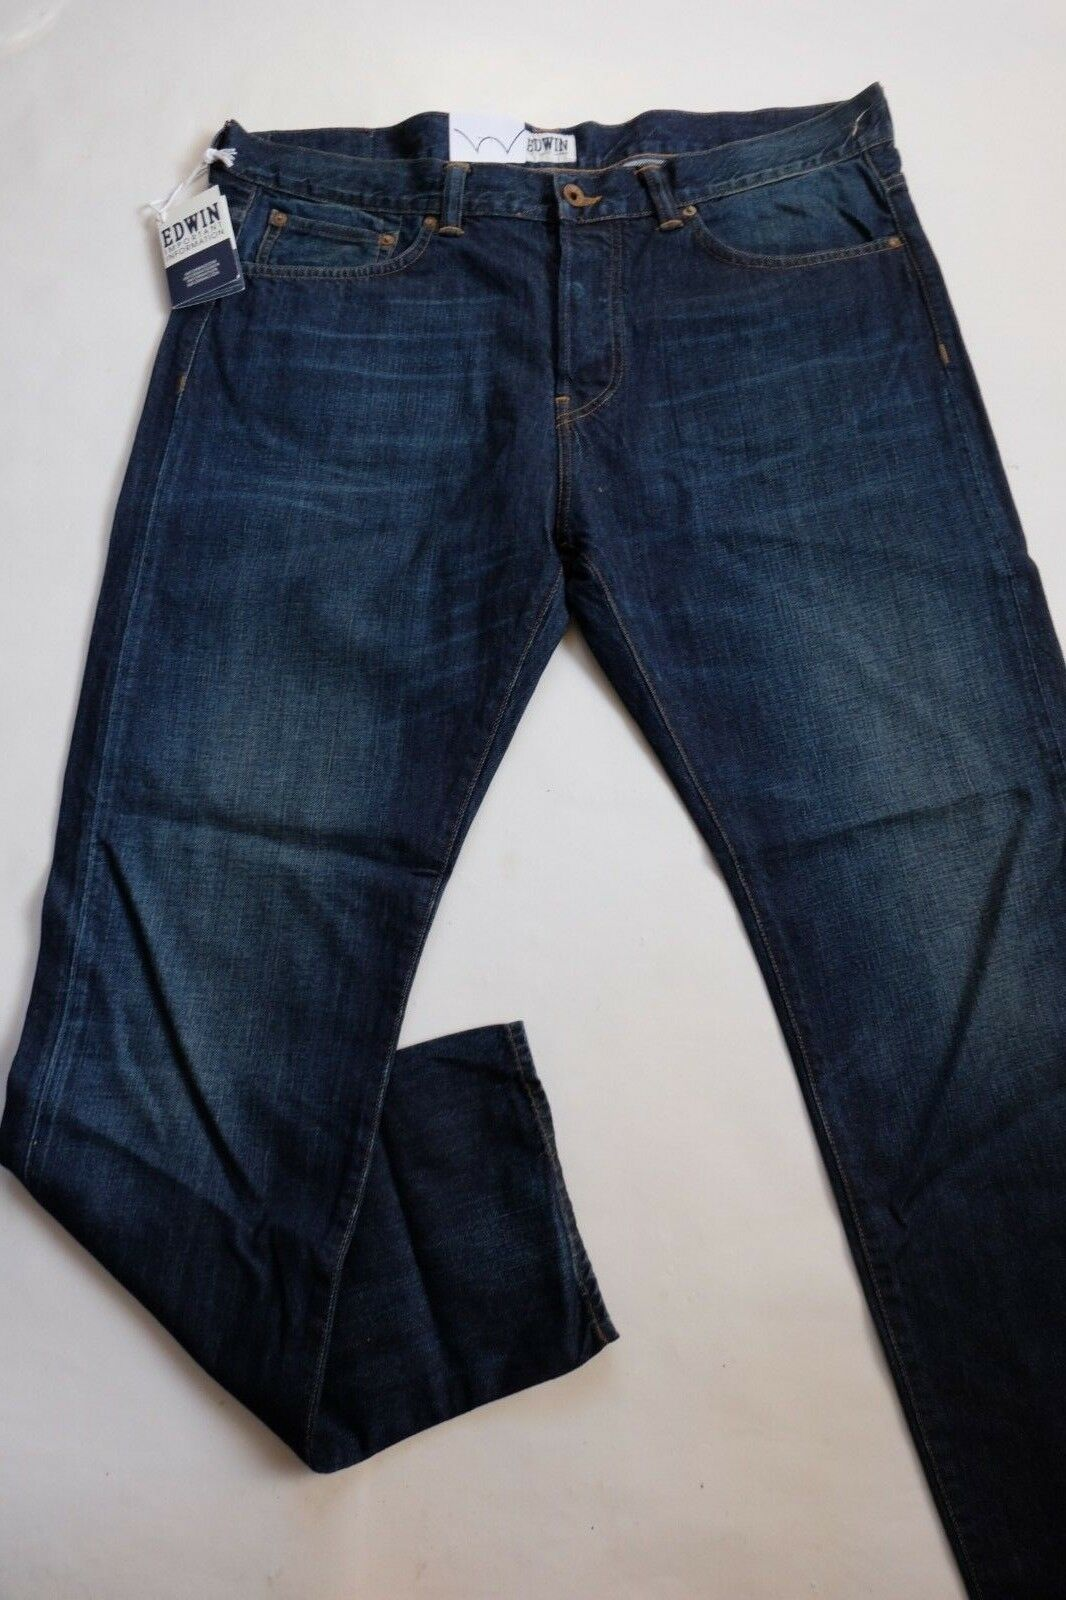 JEANS EDWIN ED 80 SLIM (compact indigo-bluee dark used) W30 L32 VAL